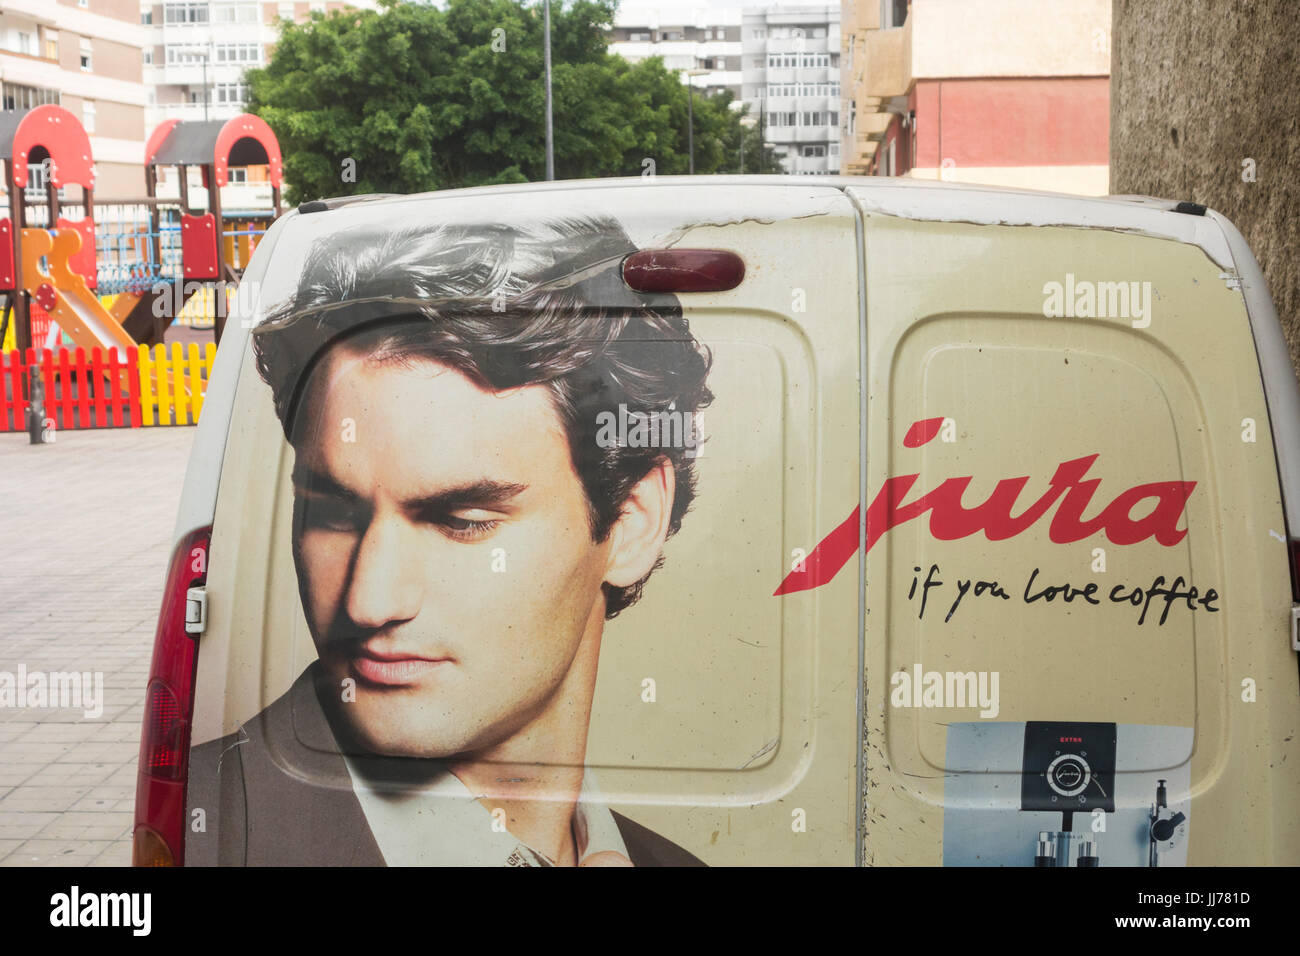 Image of Roger Federer on van delivering Jura coffee (one of his sponsors) in Spain. - Stock Image